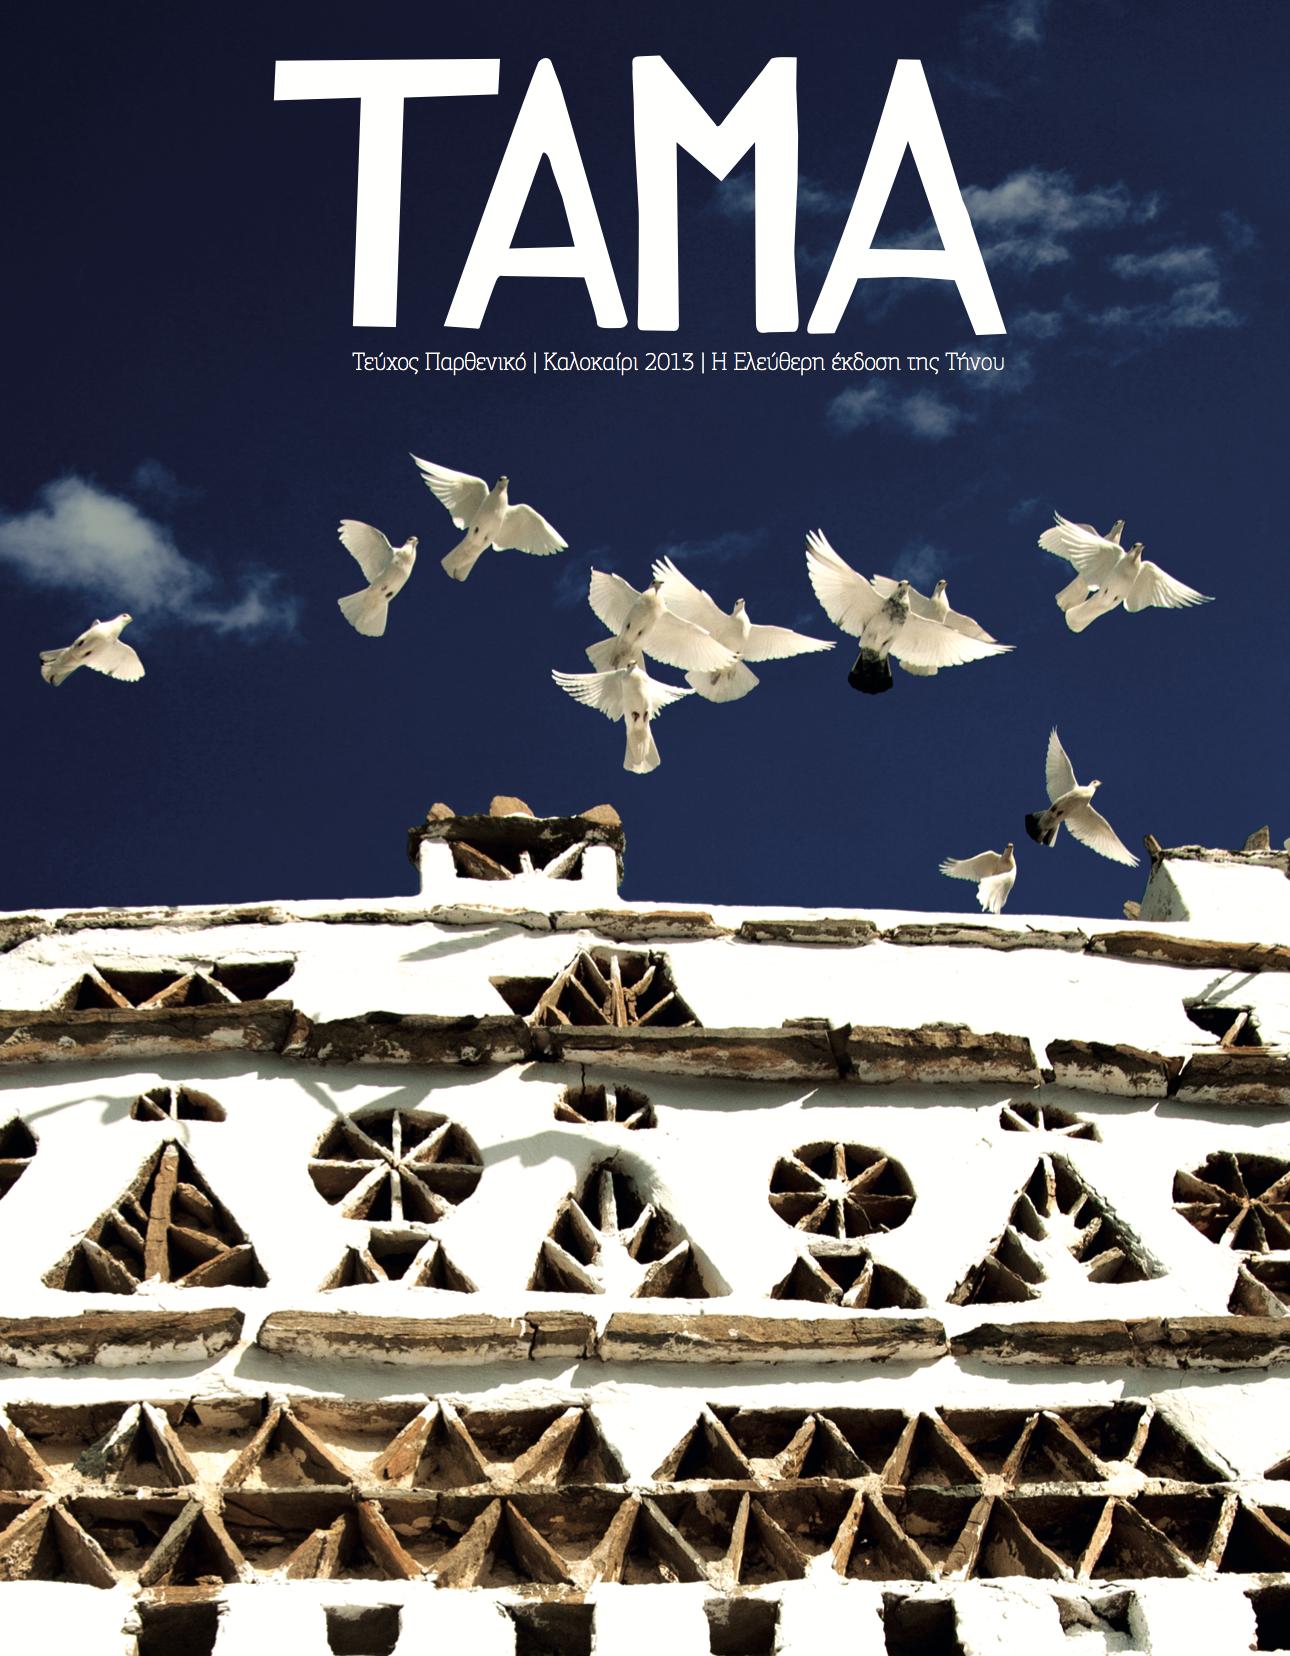 TAMA 2013